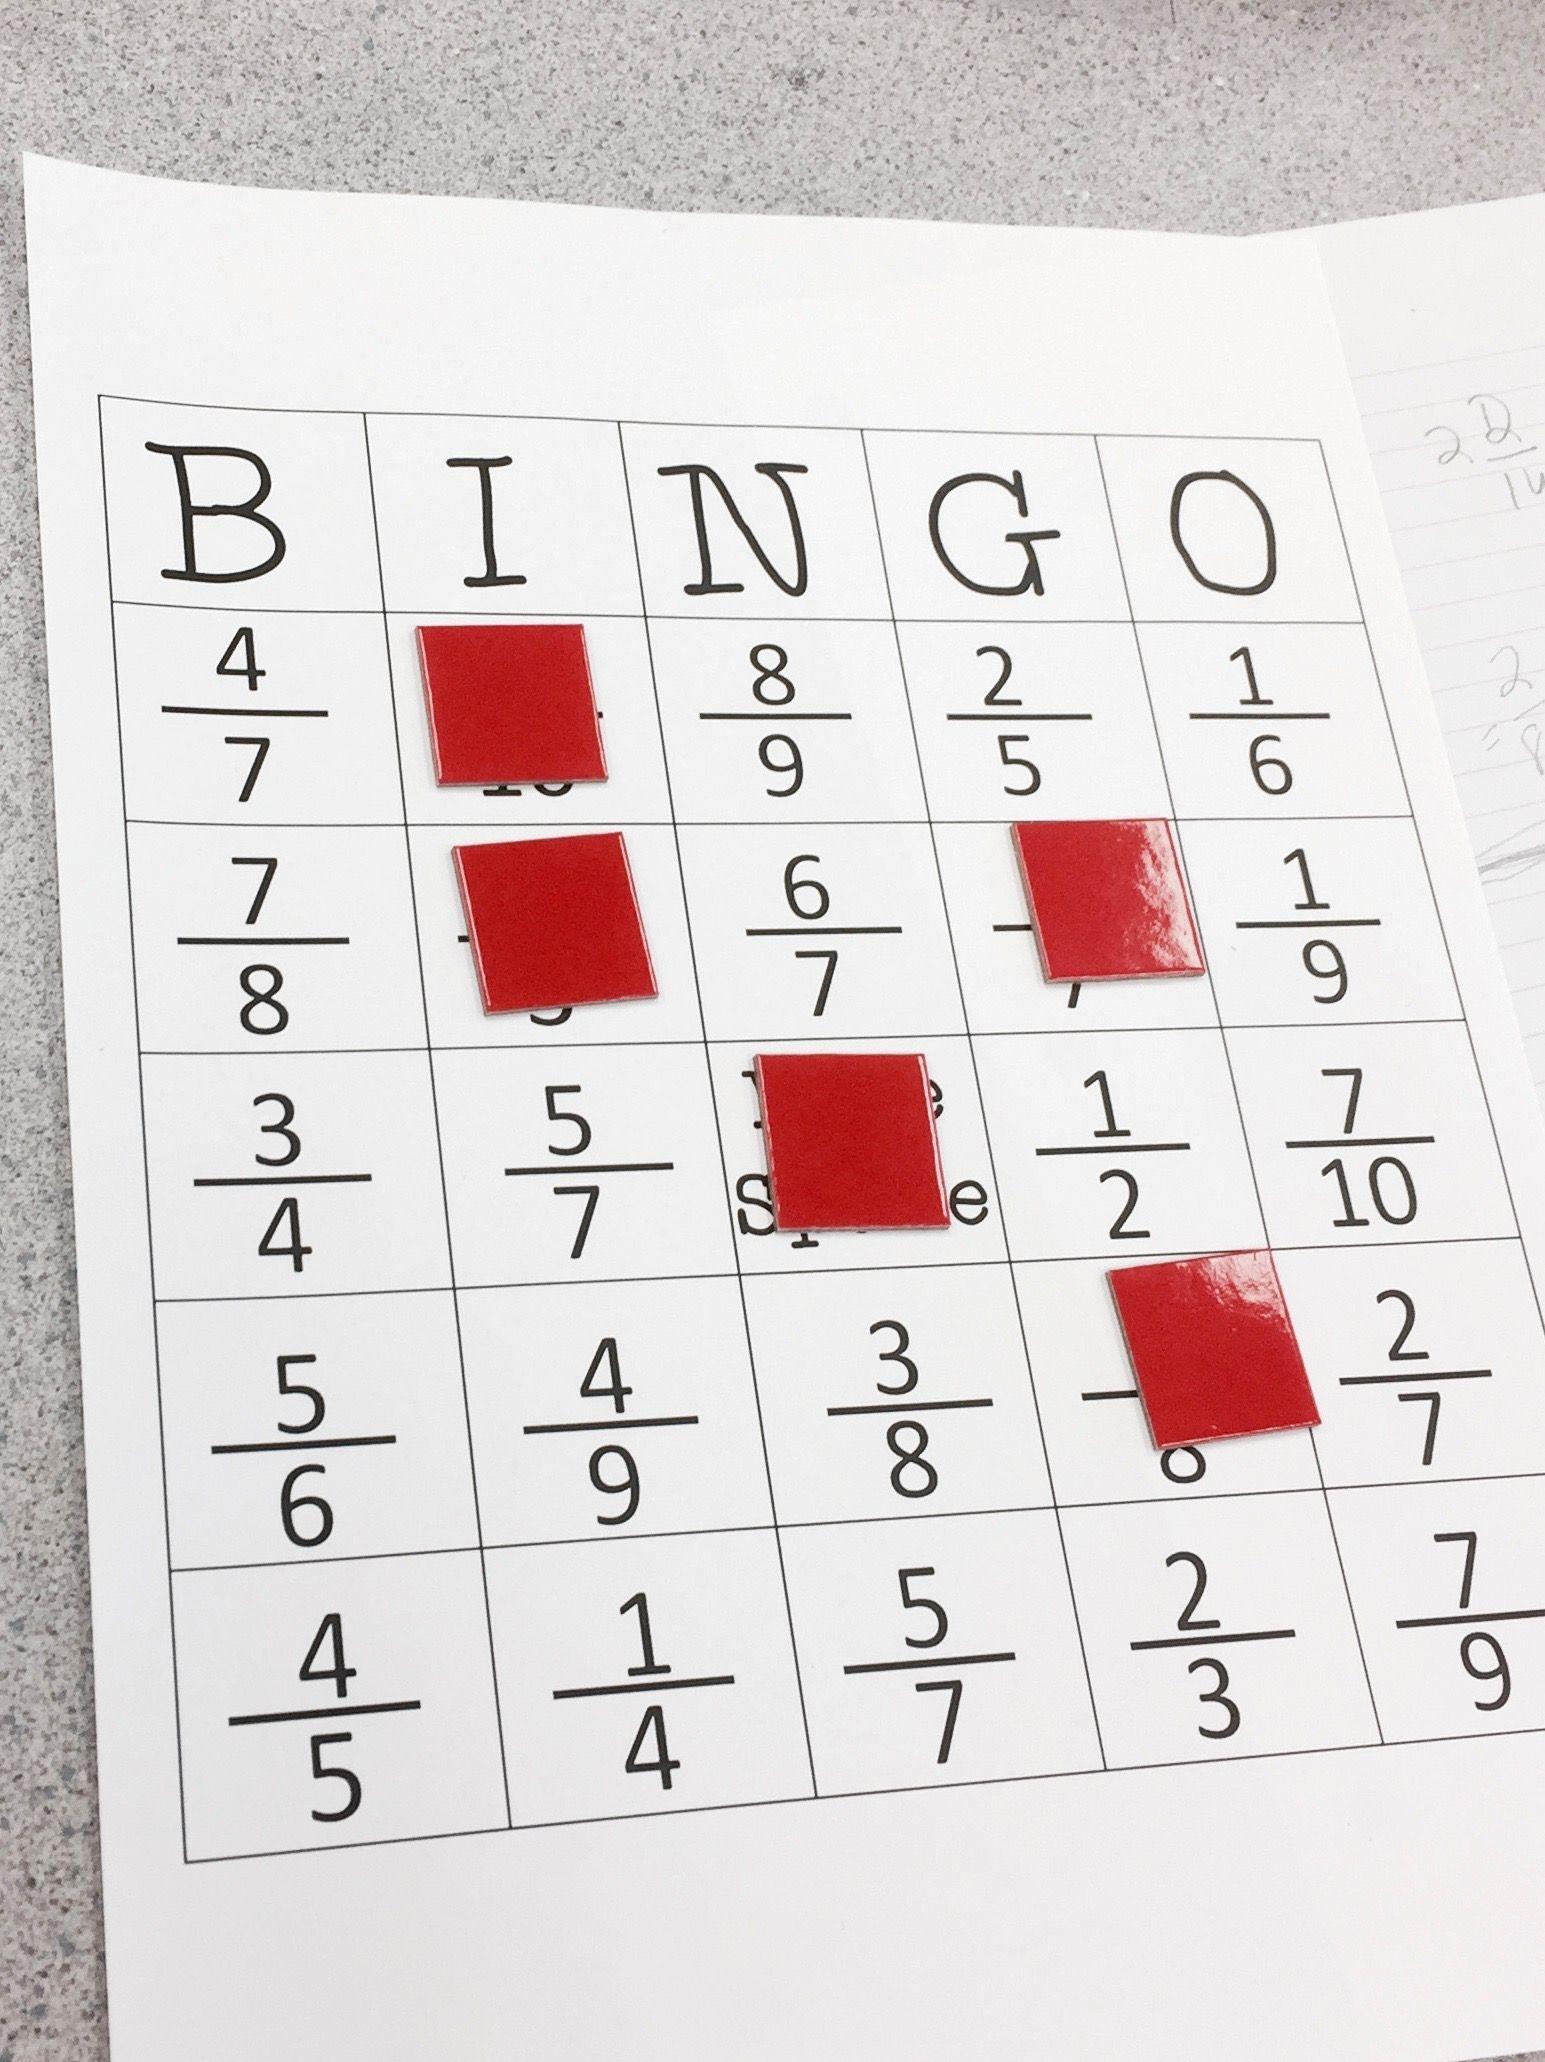 Equivalent Fraction Bingo | Elementary Education Collaborative Board - Fraction Bingo Cards Printable Free